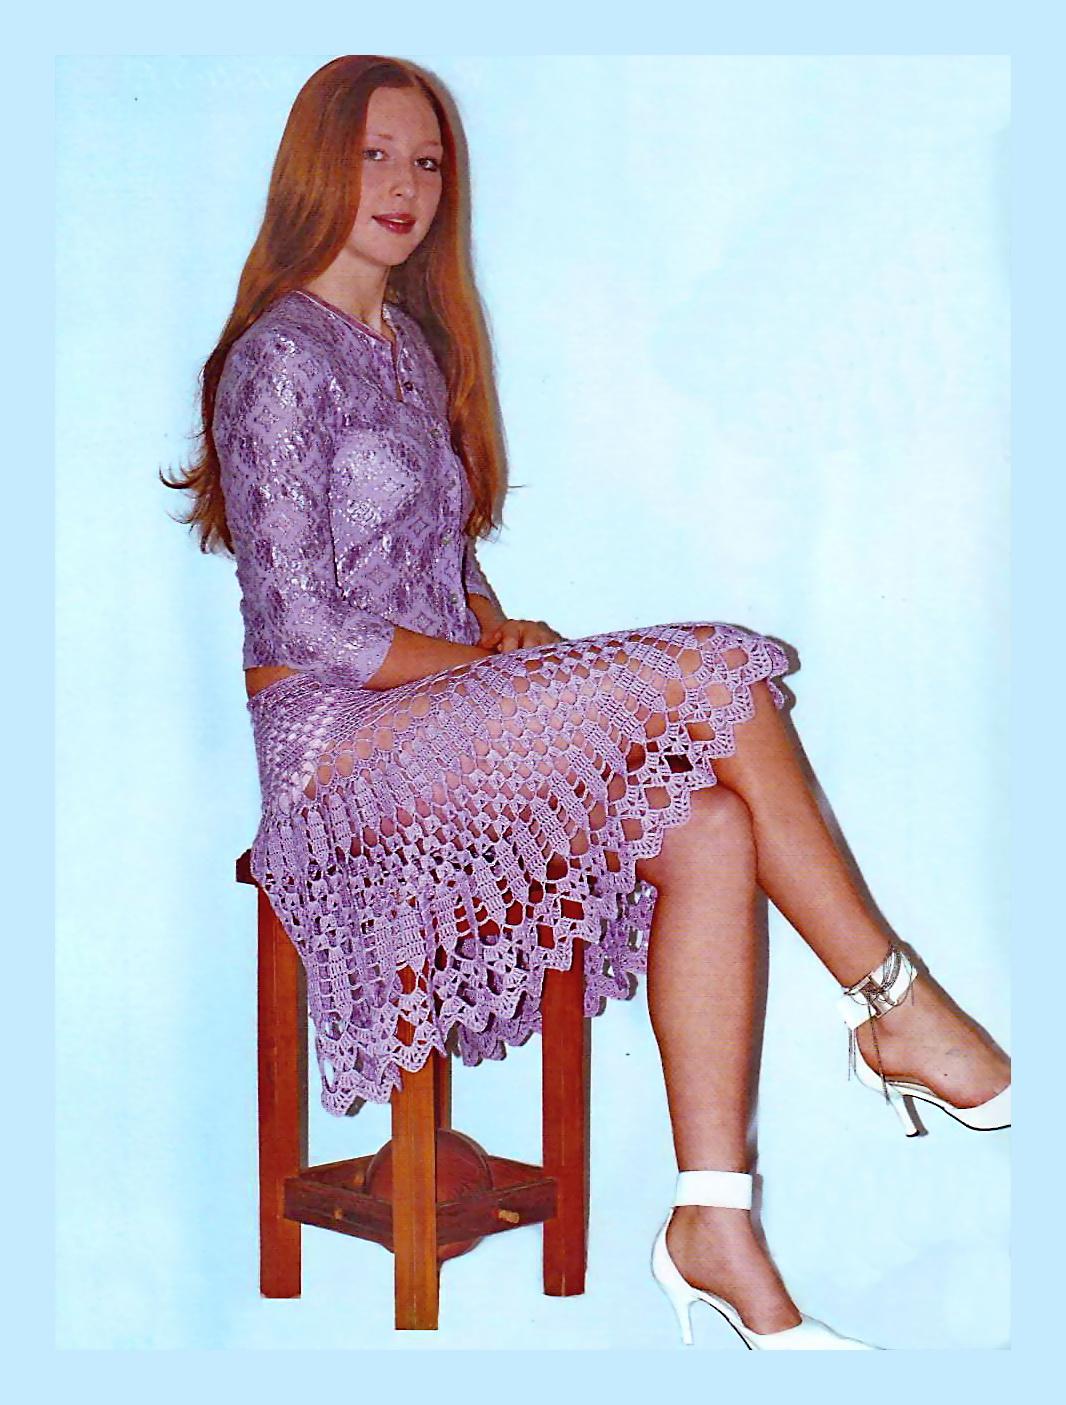 Схема вязания крючком сиреневой юбки с оборками.